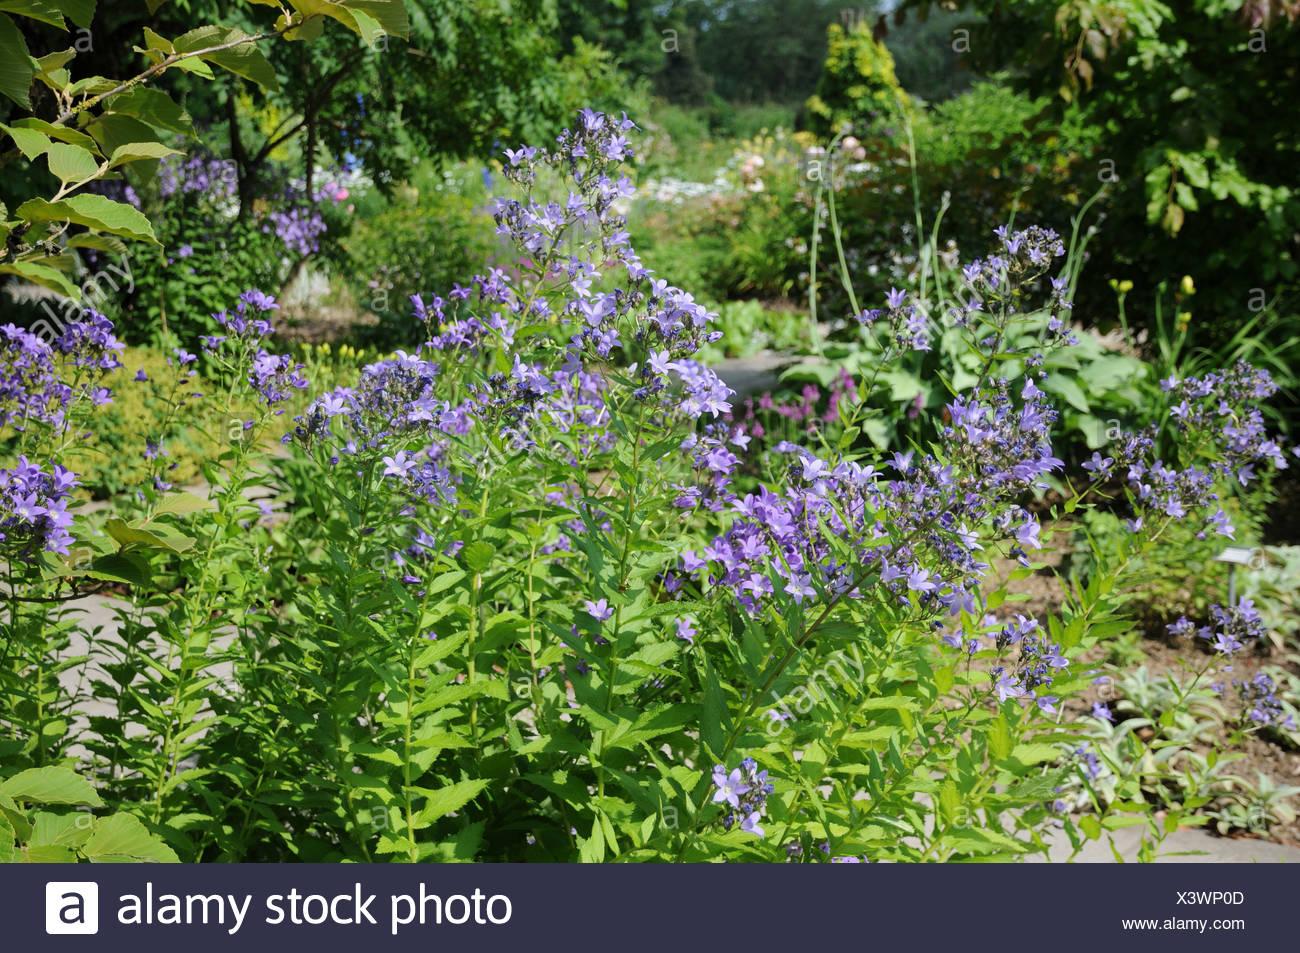 Milky Bellflowers - Stock Image